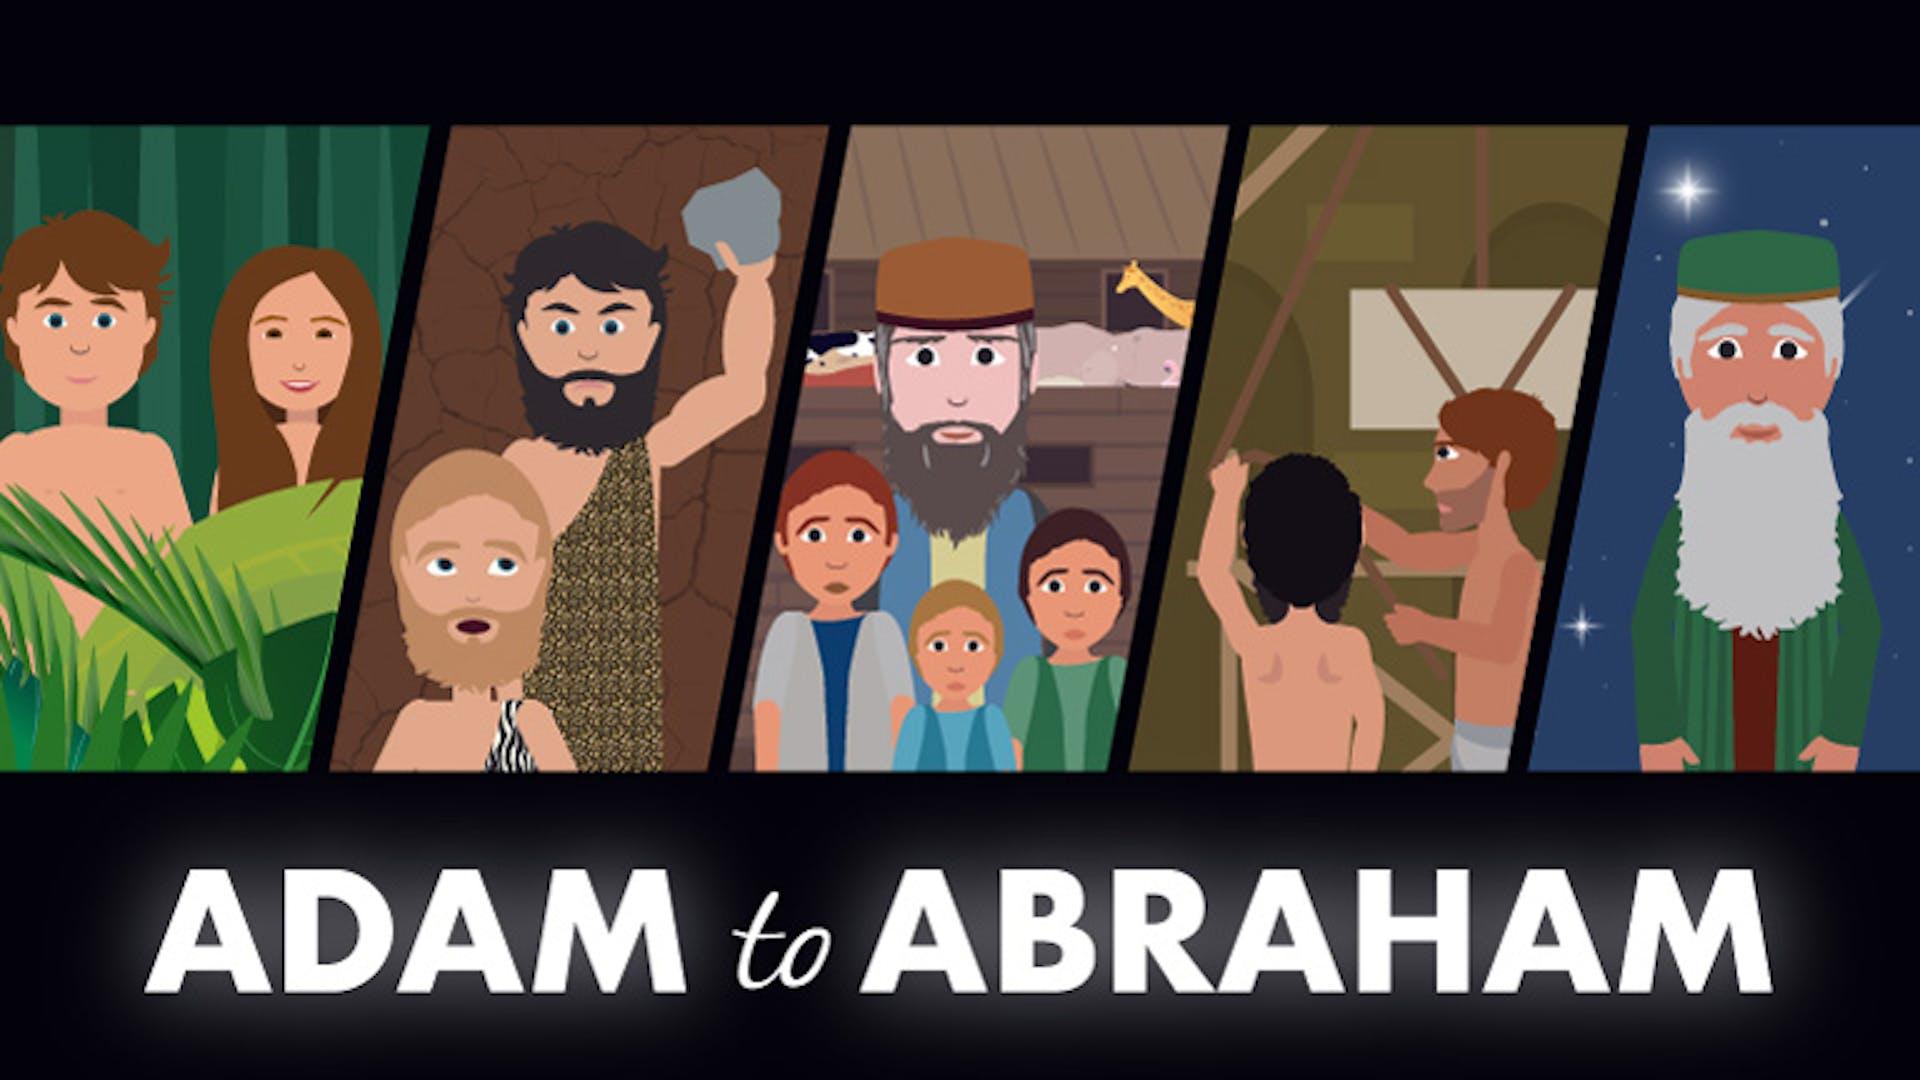 Adam to Abraham Genesis history